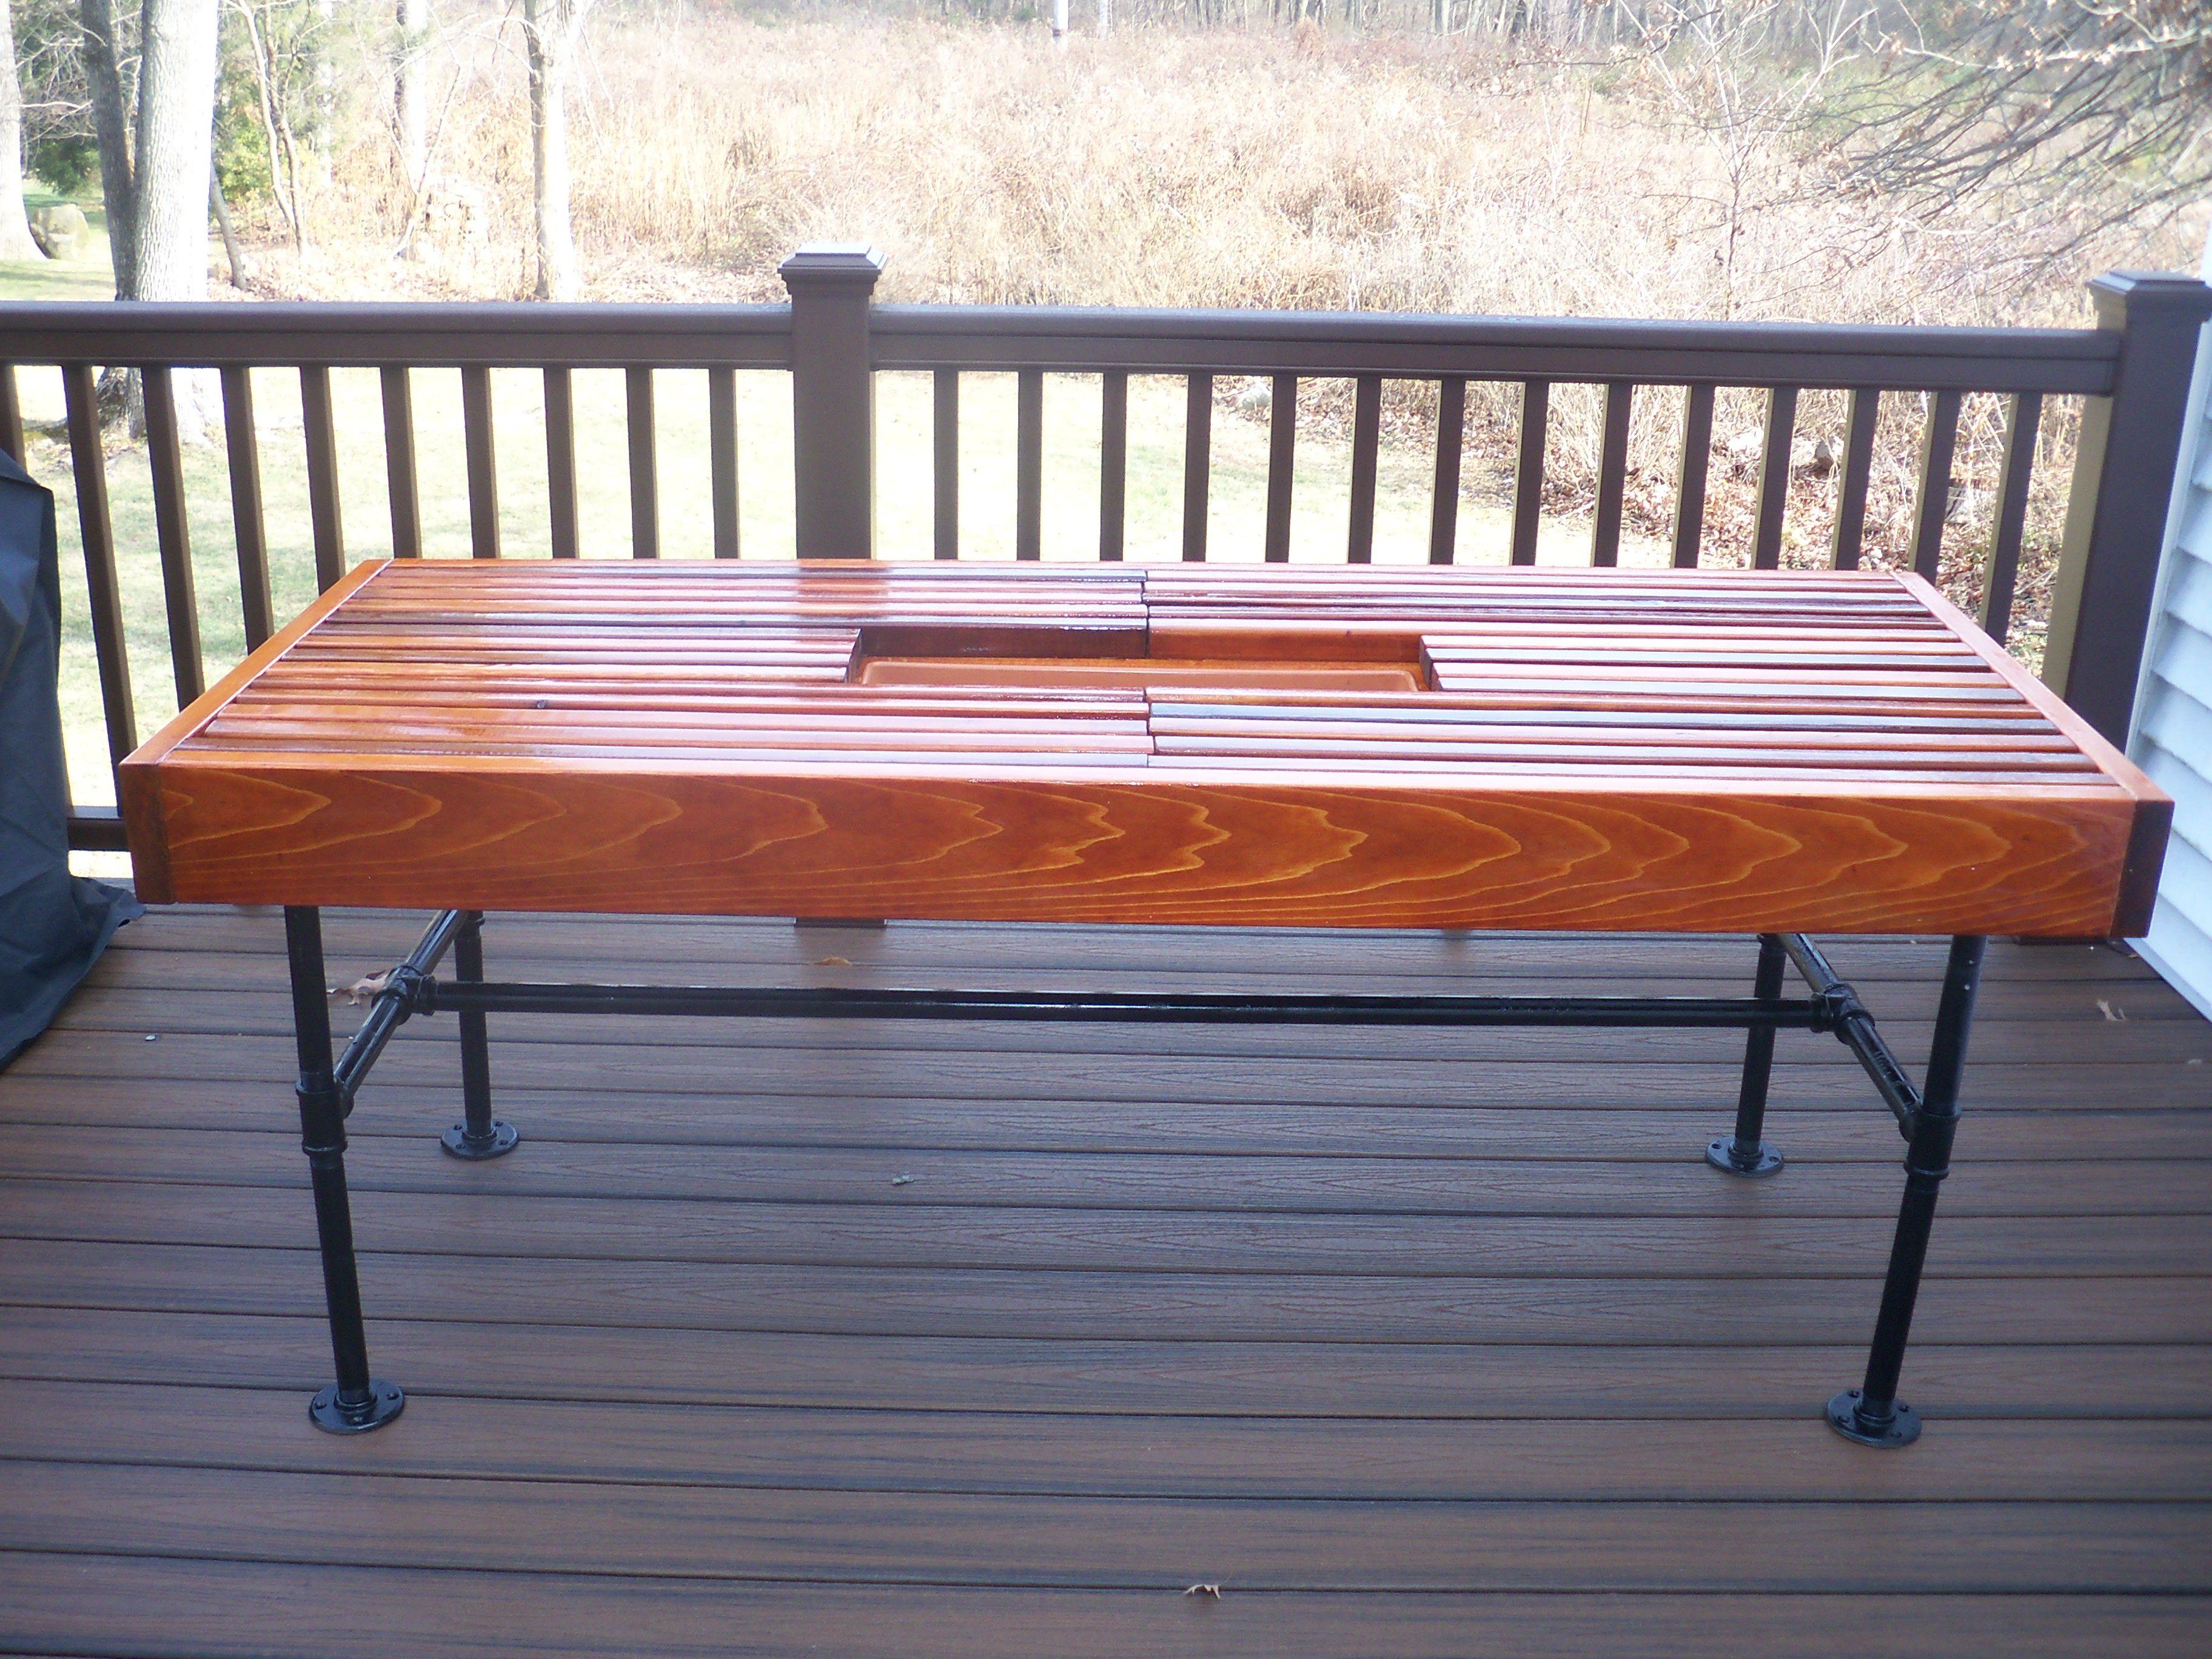 Cedar outdoor table with built-in wine & beer cooler with metal pipe legs.